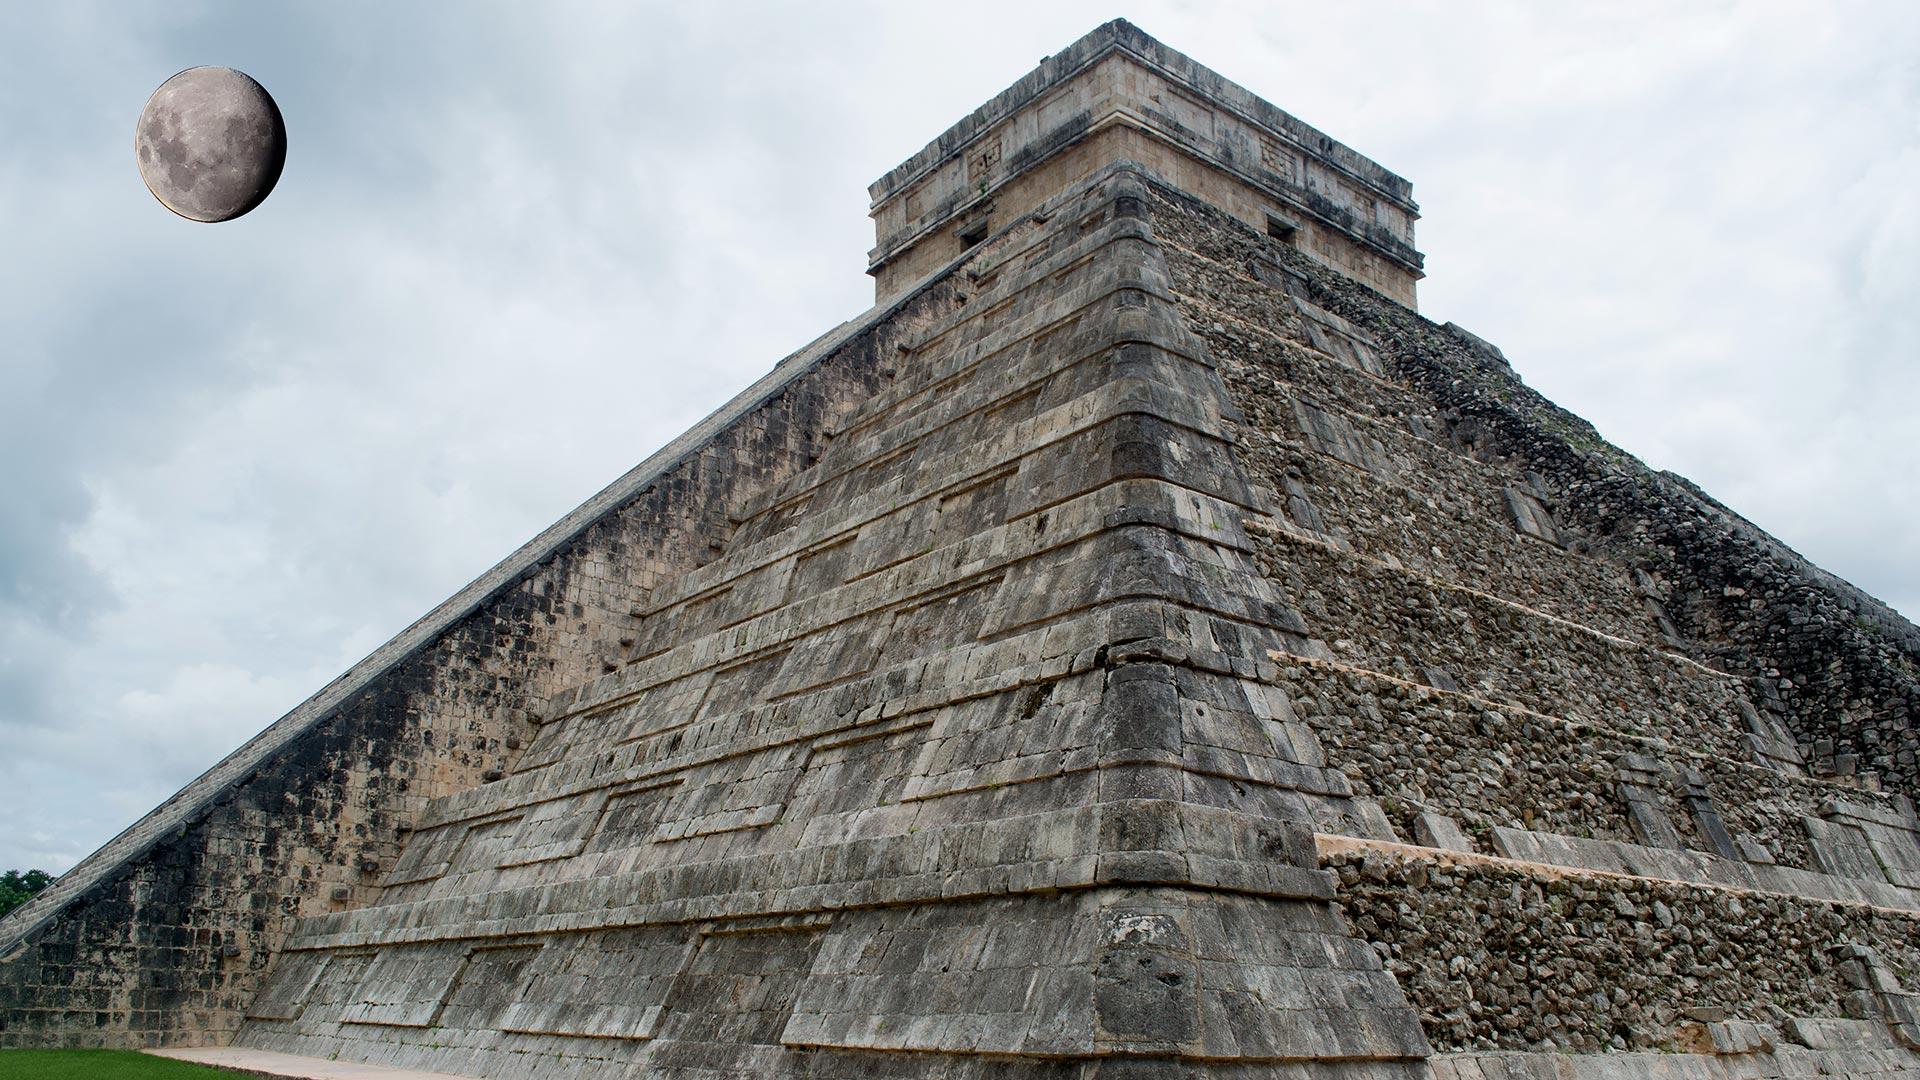 El Castillo – Chichen Itza - Mexico